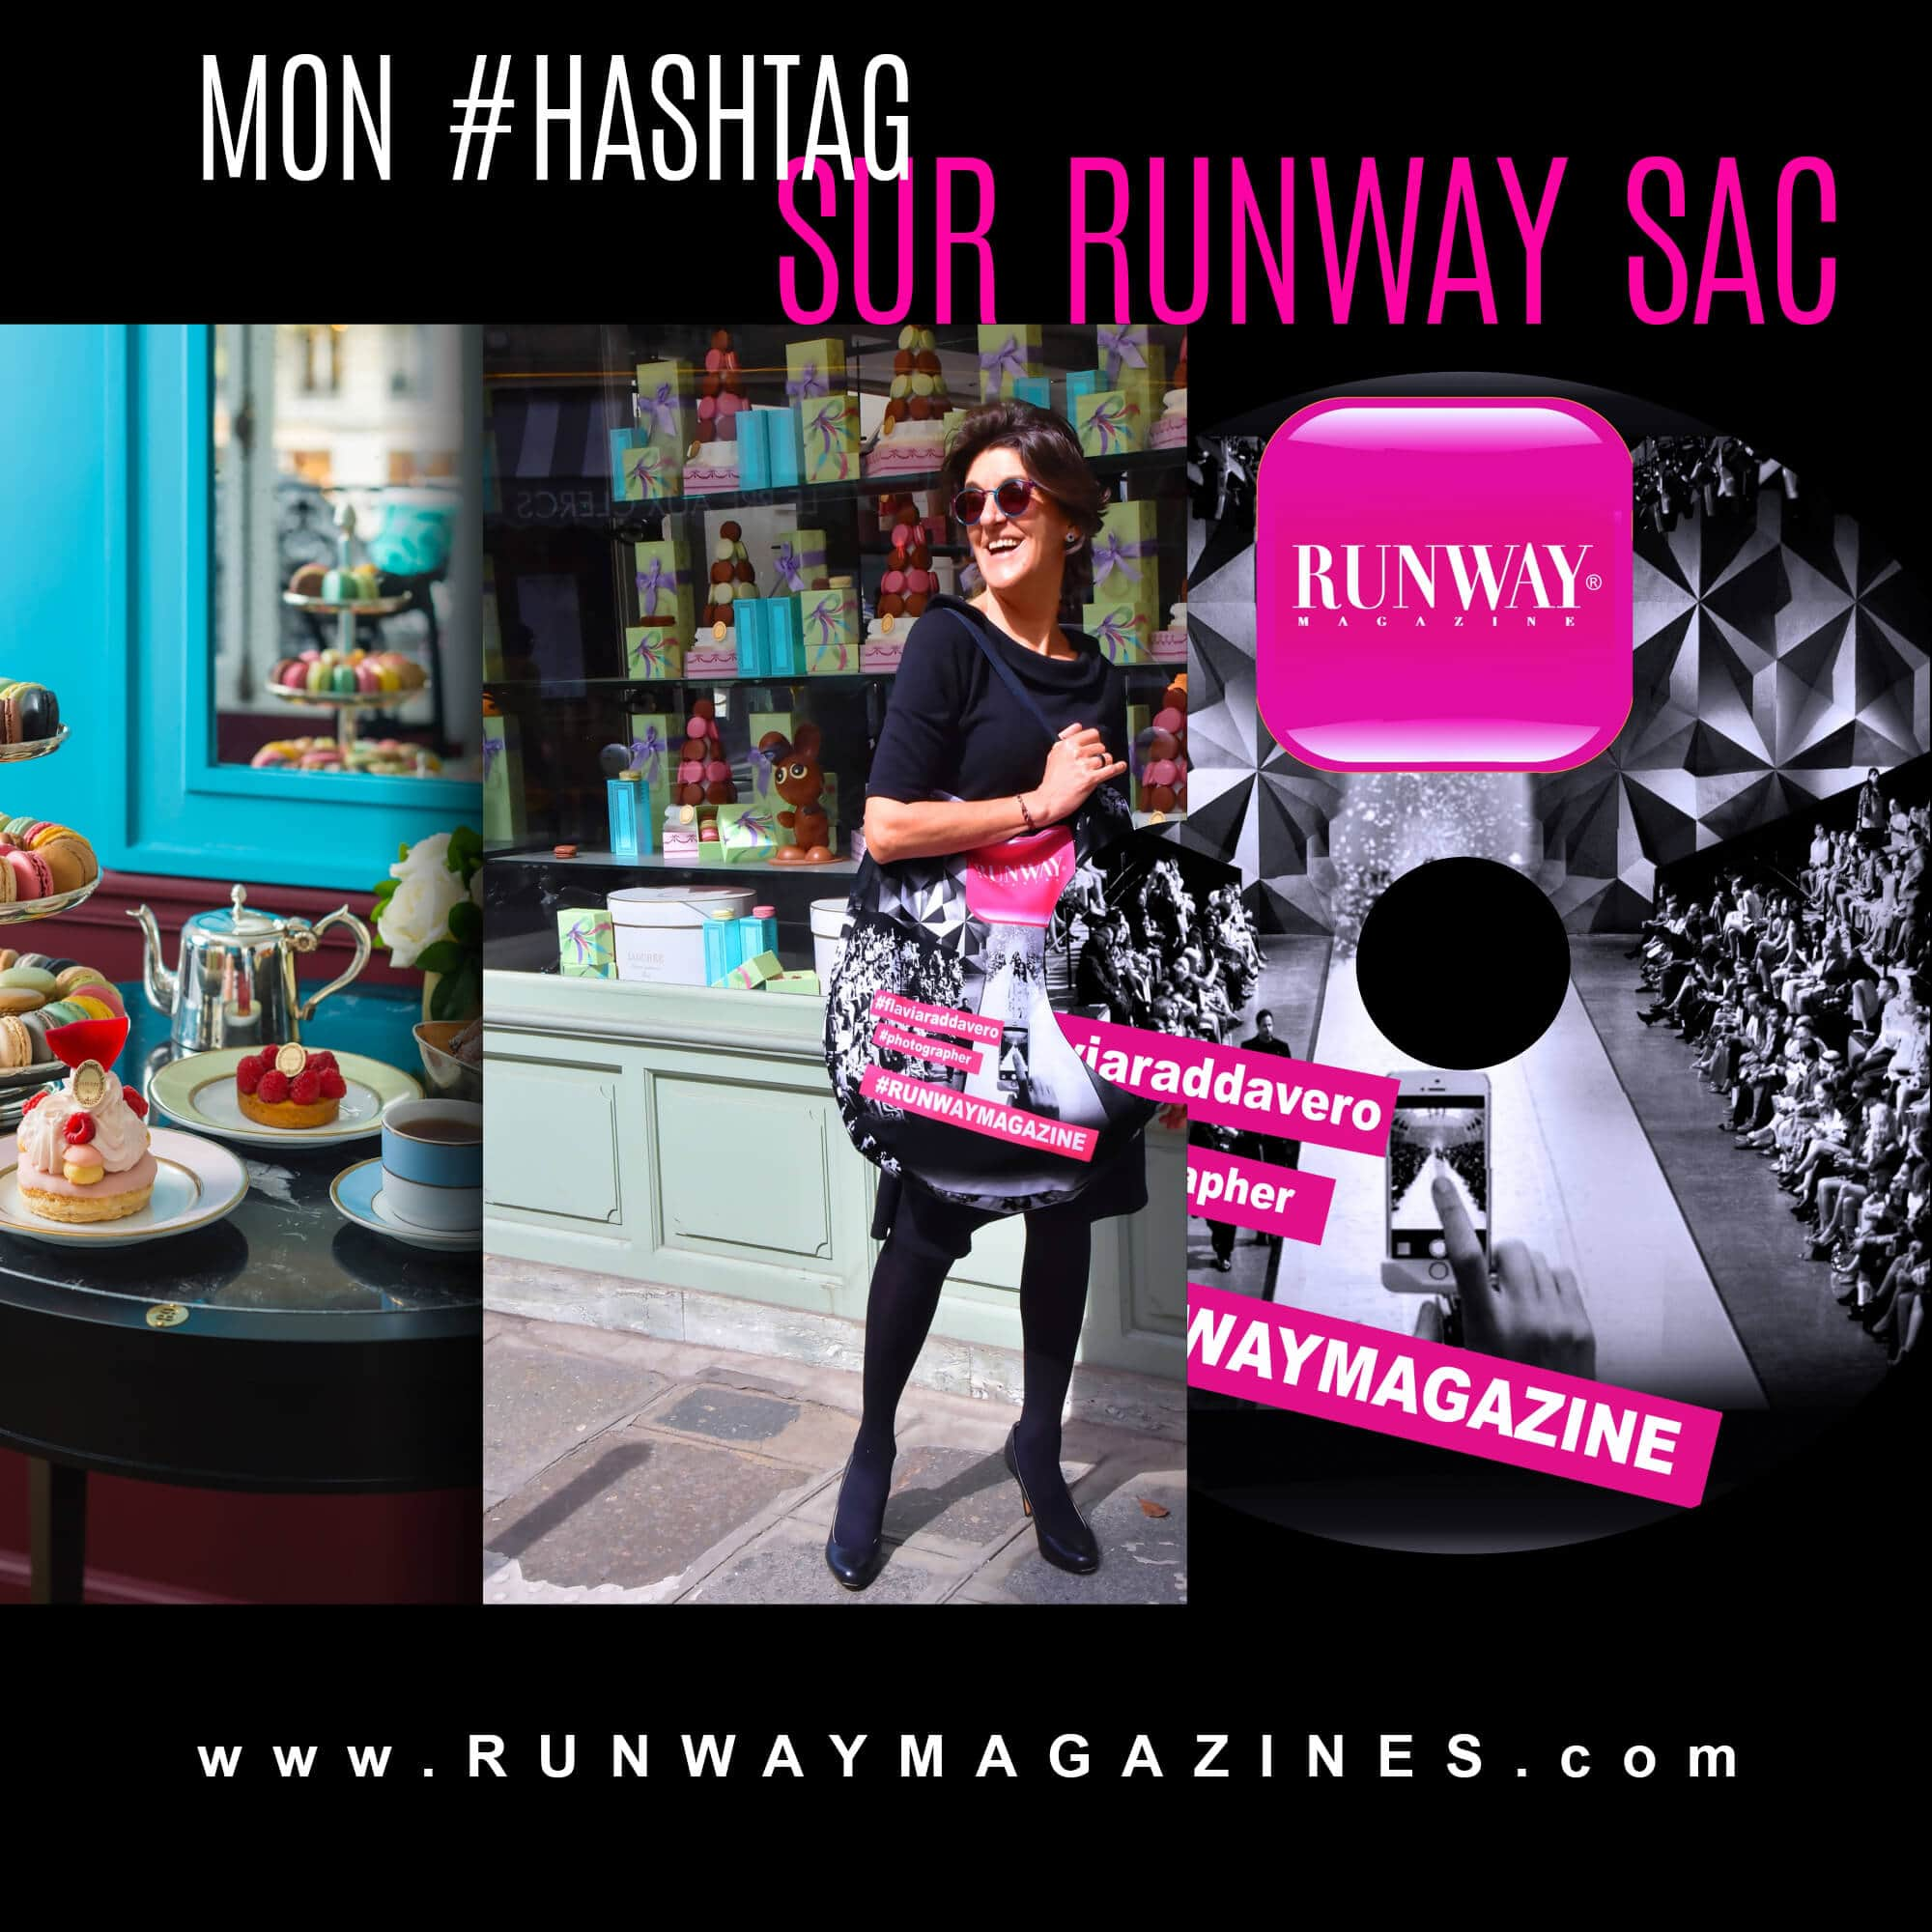 Histoire d'une Photographe de Mode Flavia Raddavero